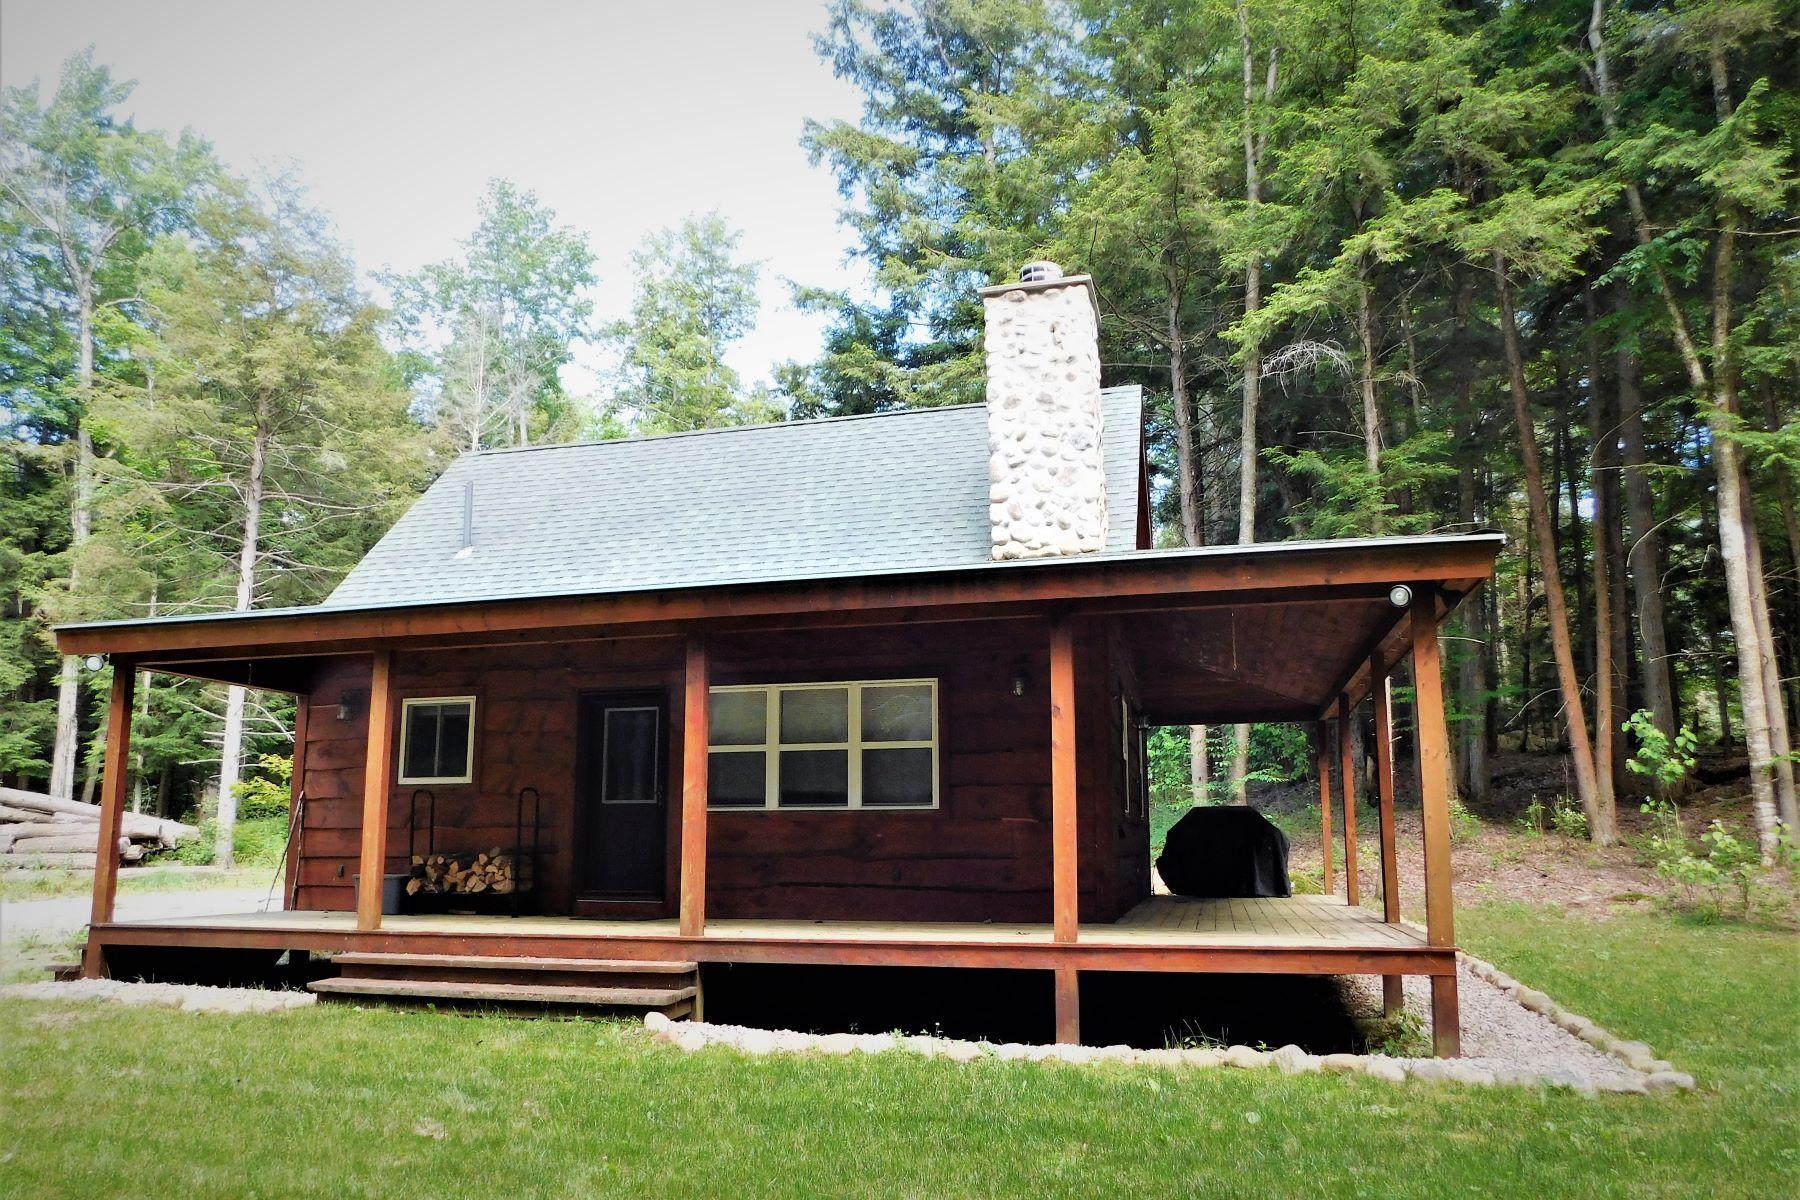 Maison unifamiliale pour l Vente à Camp Rio Vista - A rare find on the Independence River 6273 Oxbow Ln Glenfield, New York 13345 États-Unis